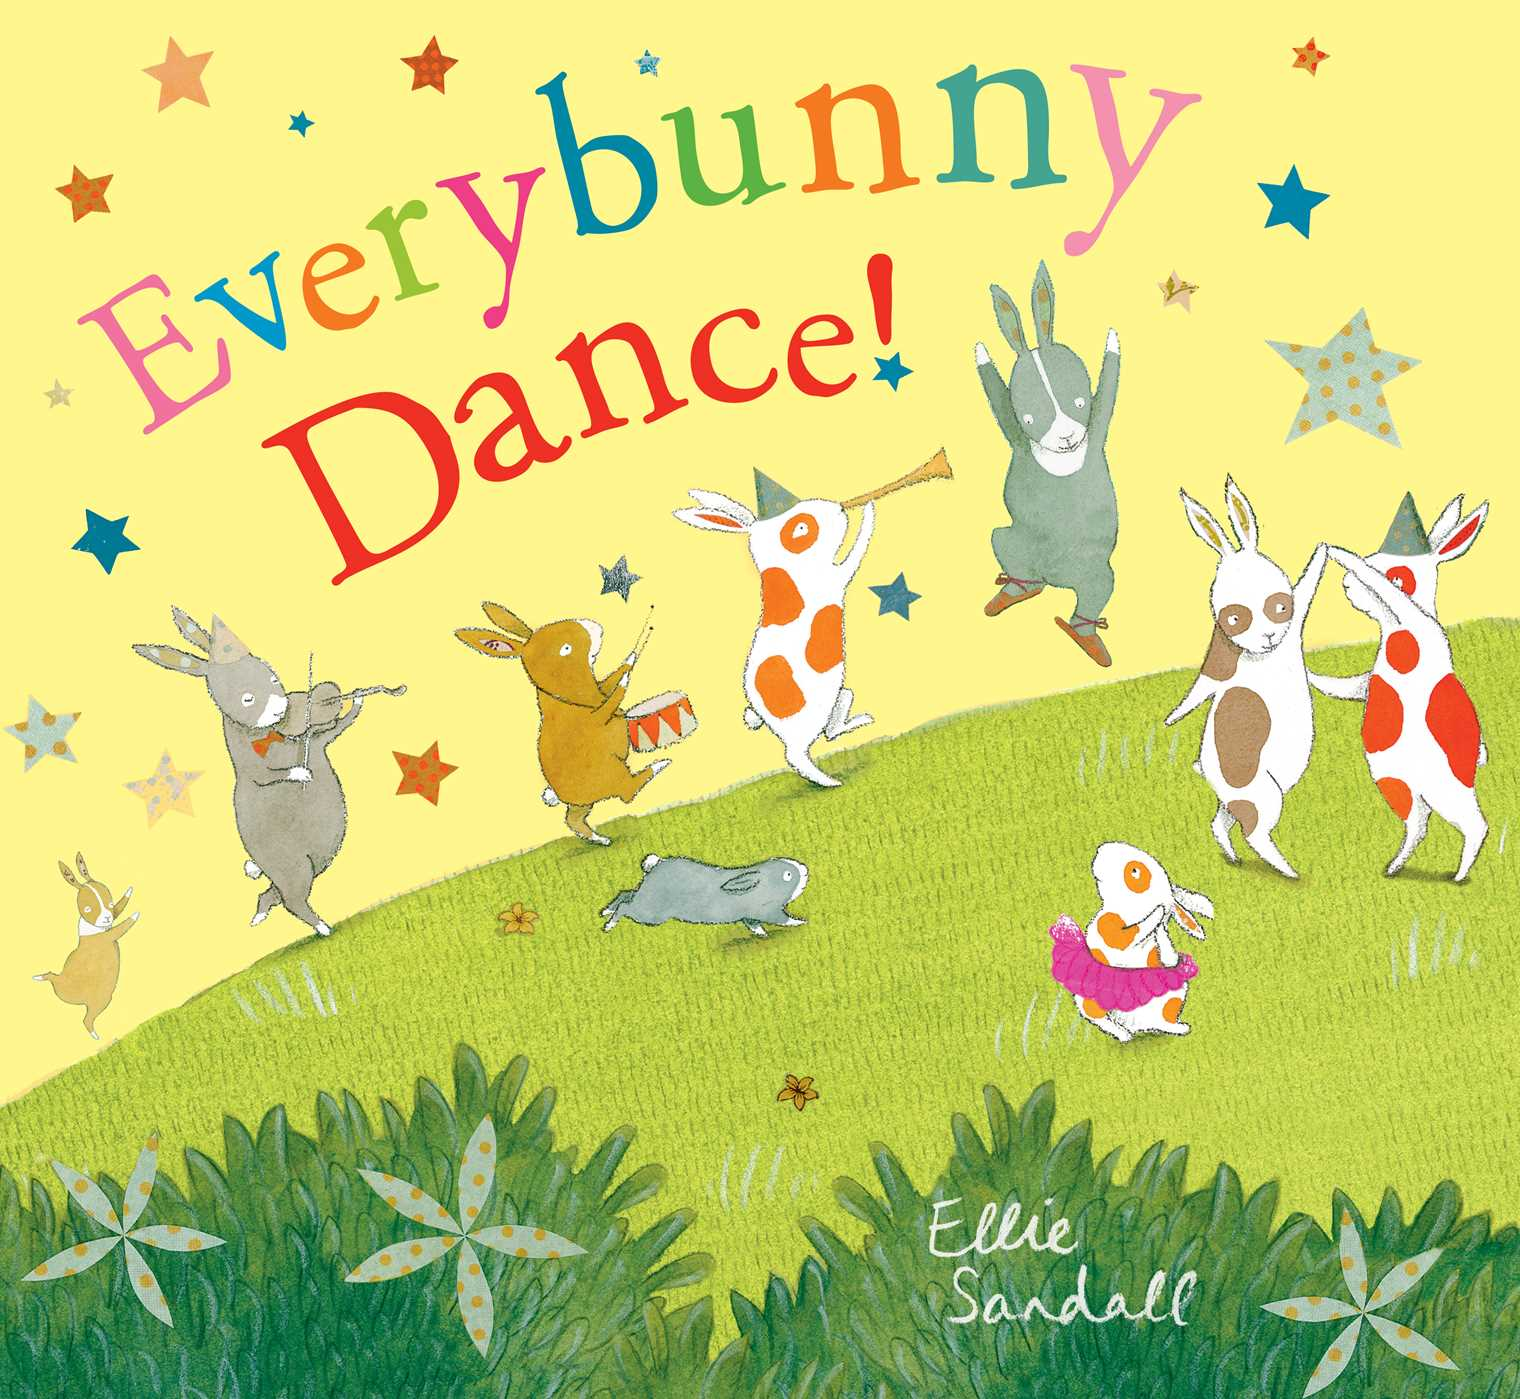 Everybunny dance 9781481498227 hr